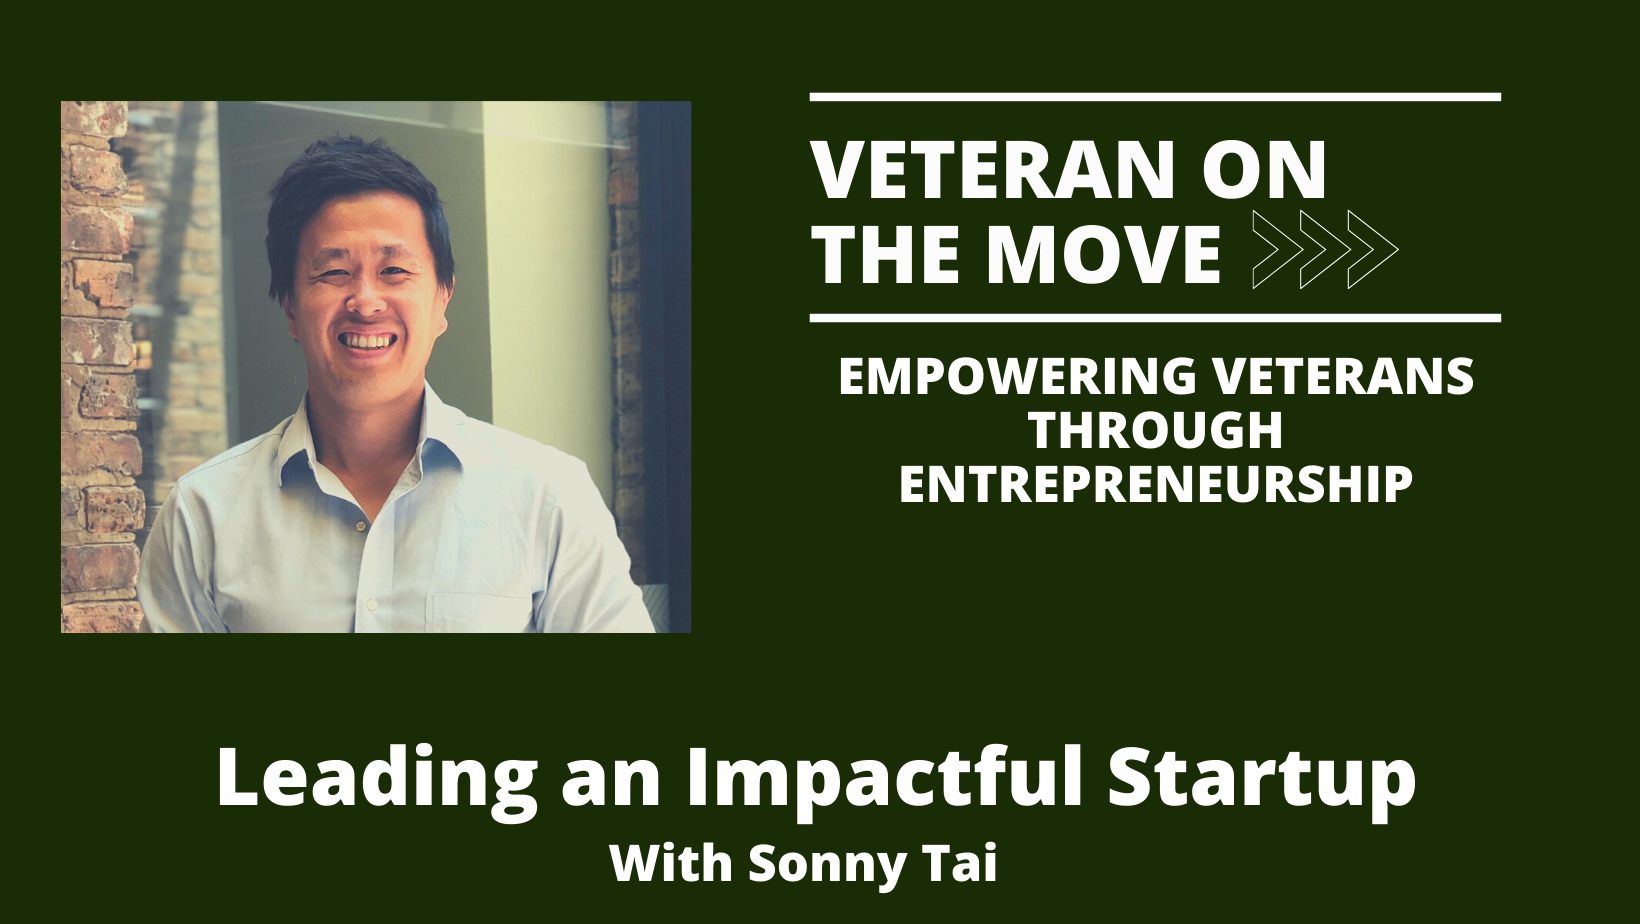 Sonny Tai, Veteran On The Move